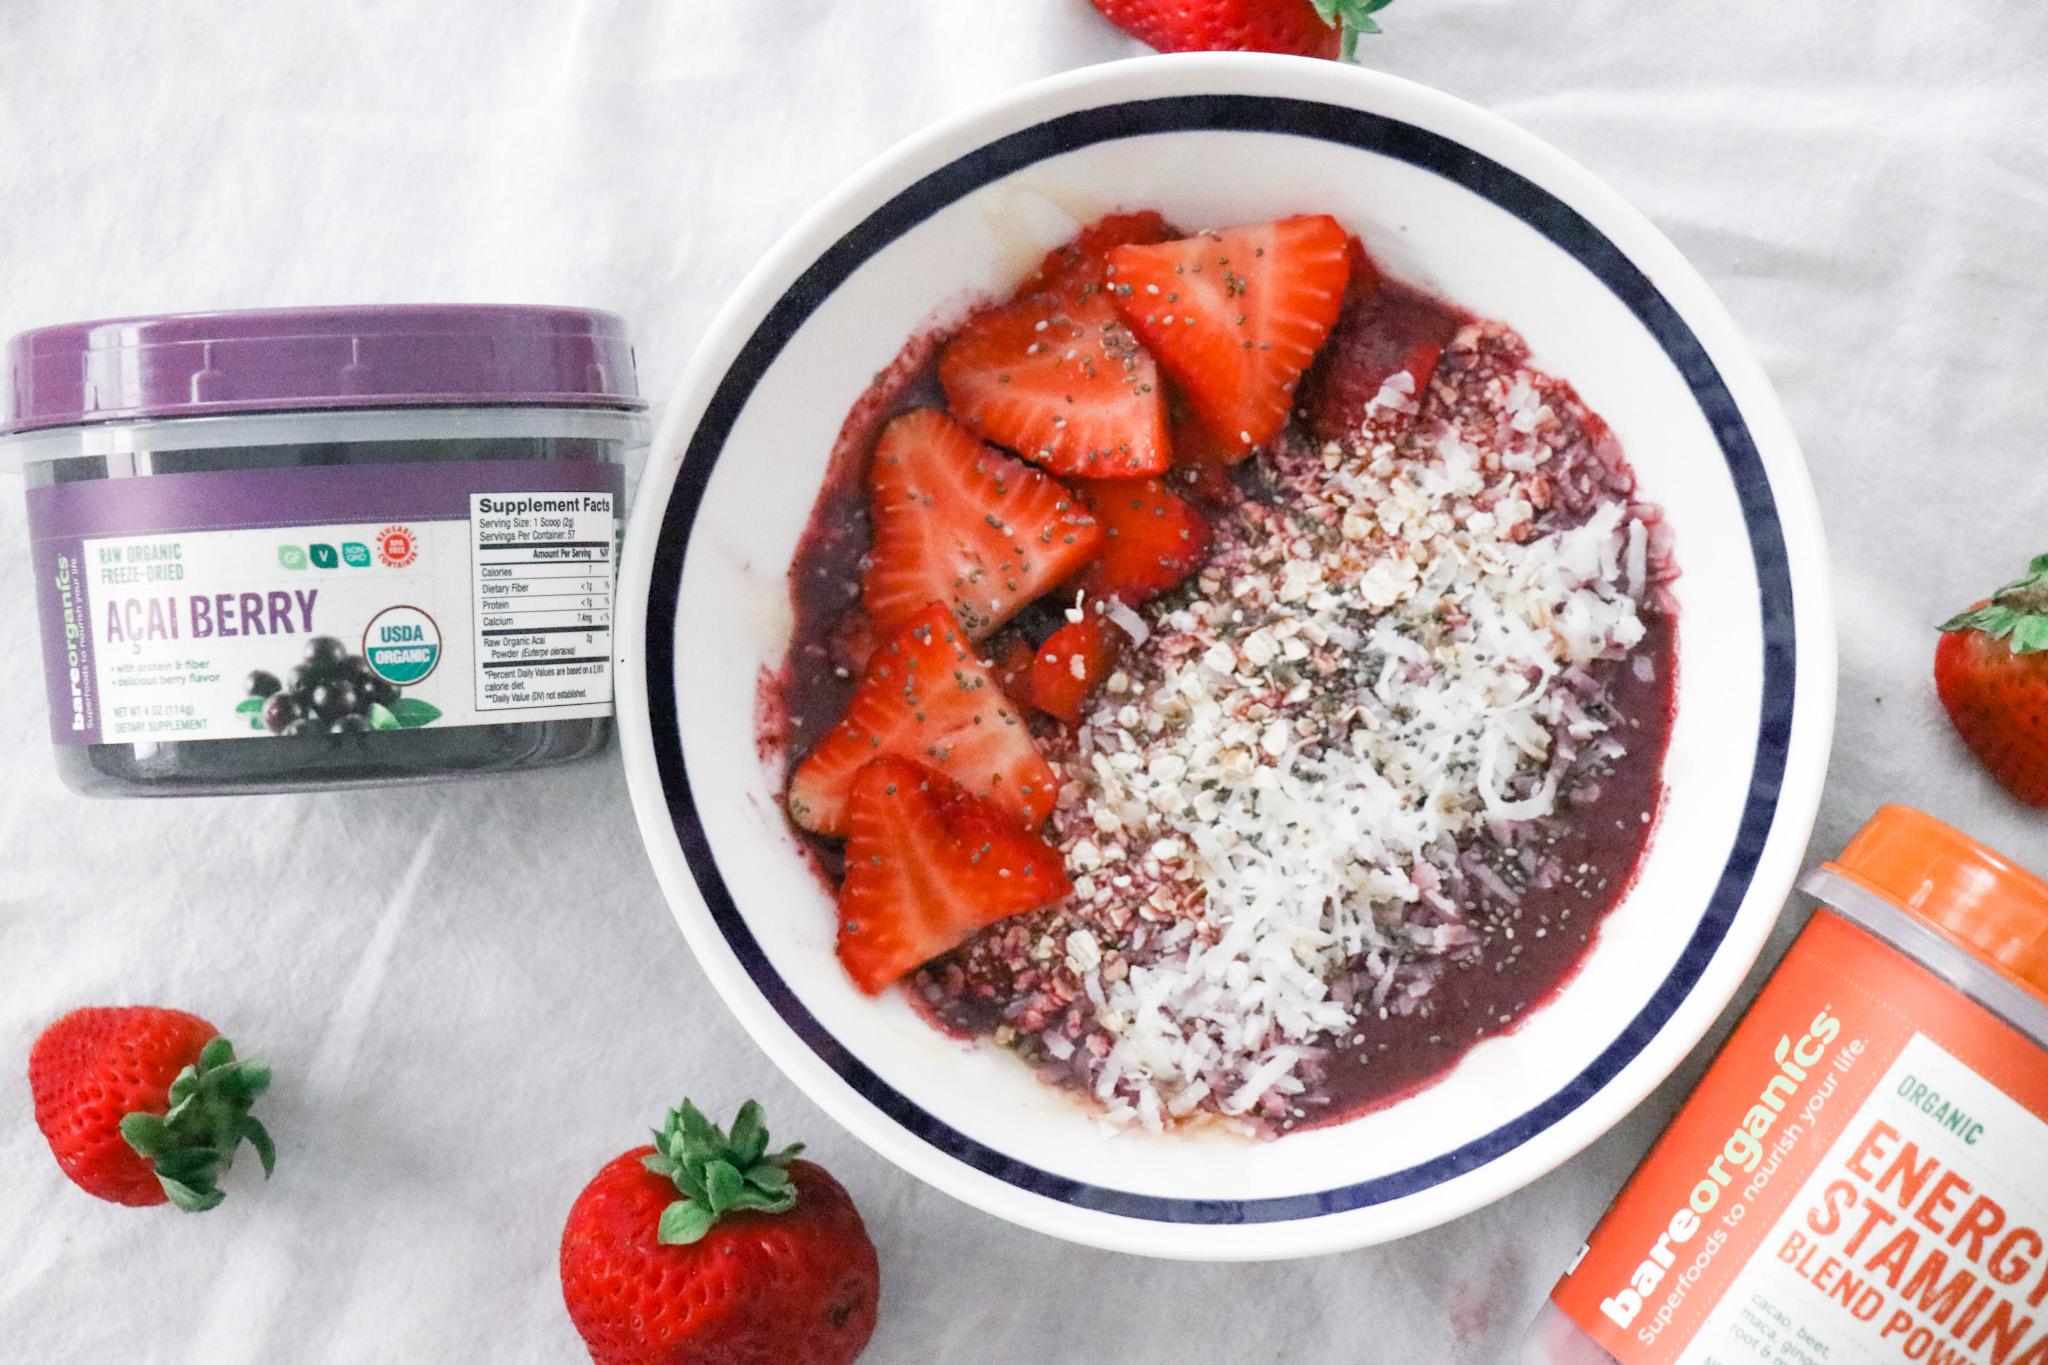 Açaí bowl, strawberries, kate spade bowl